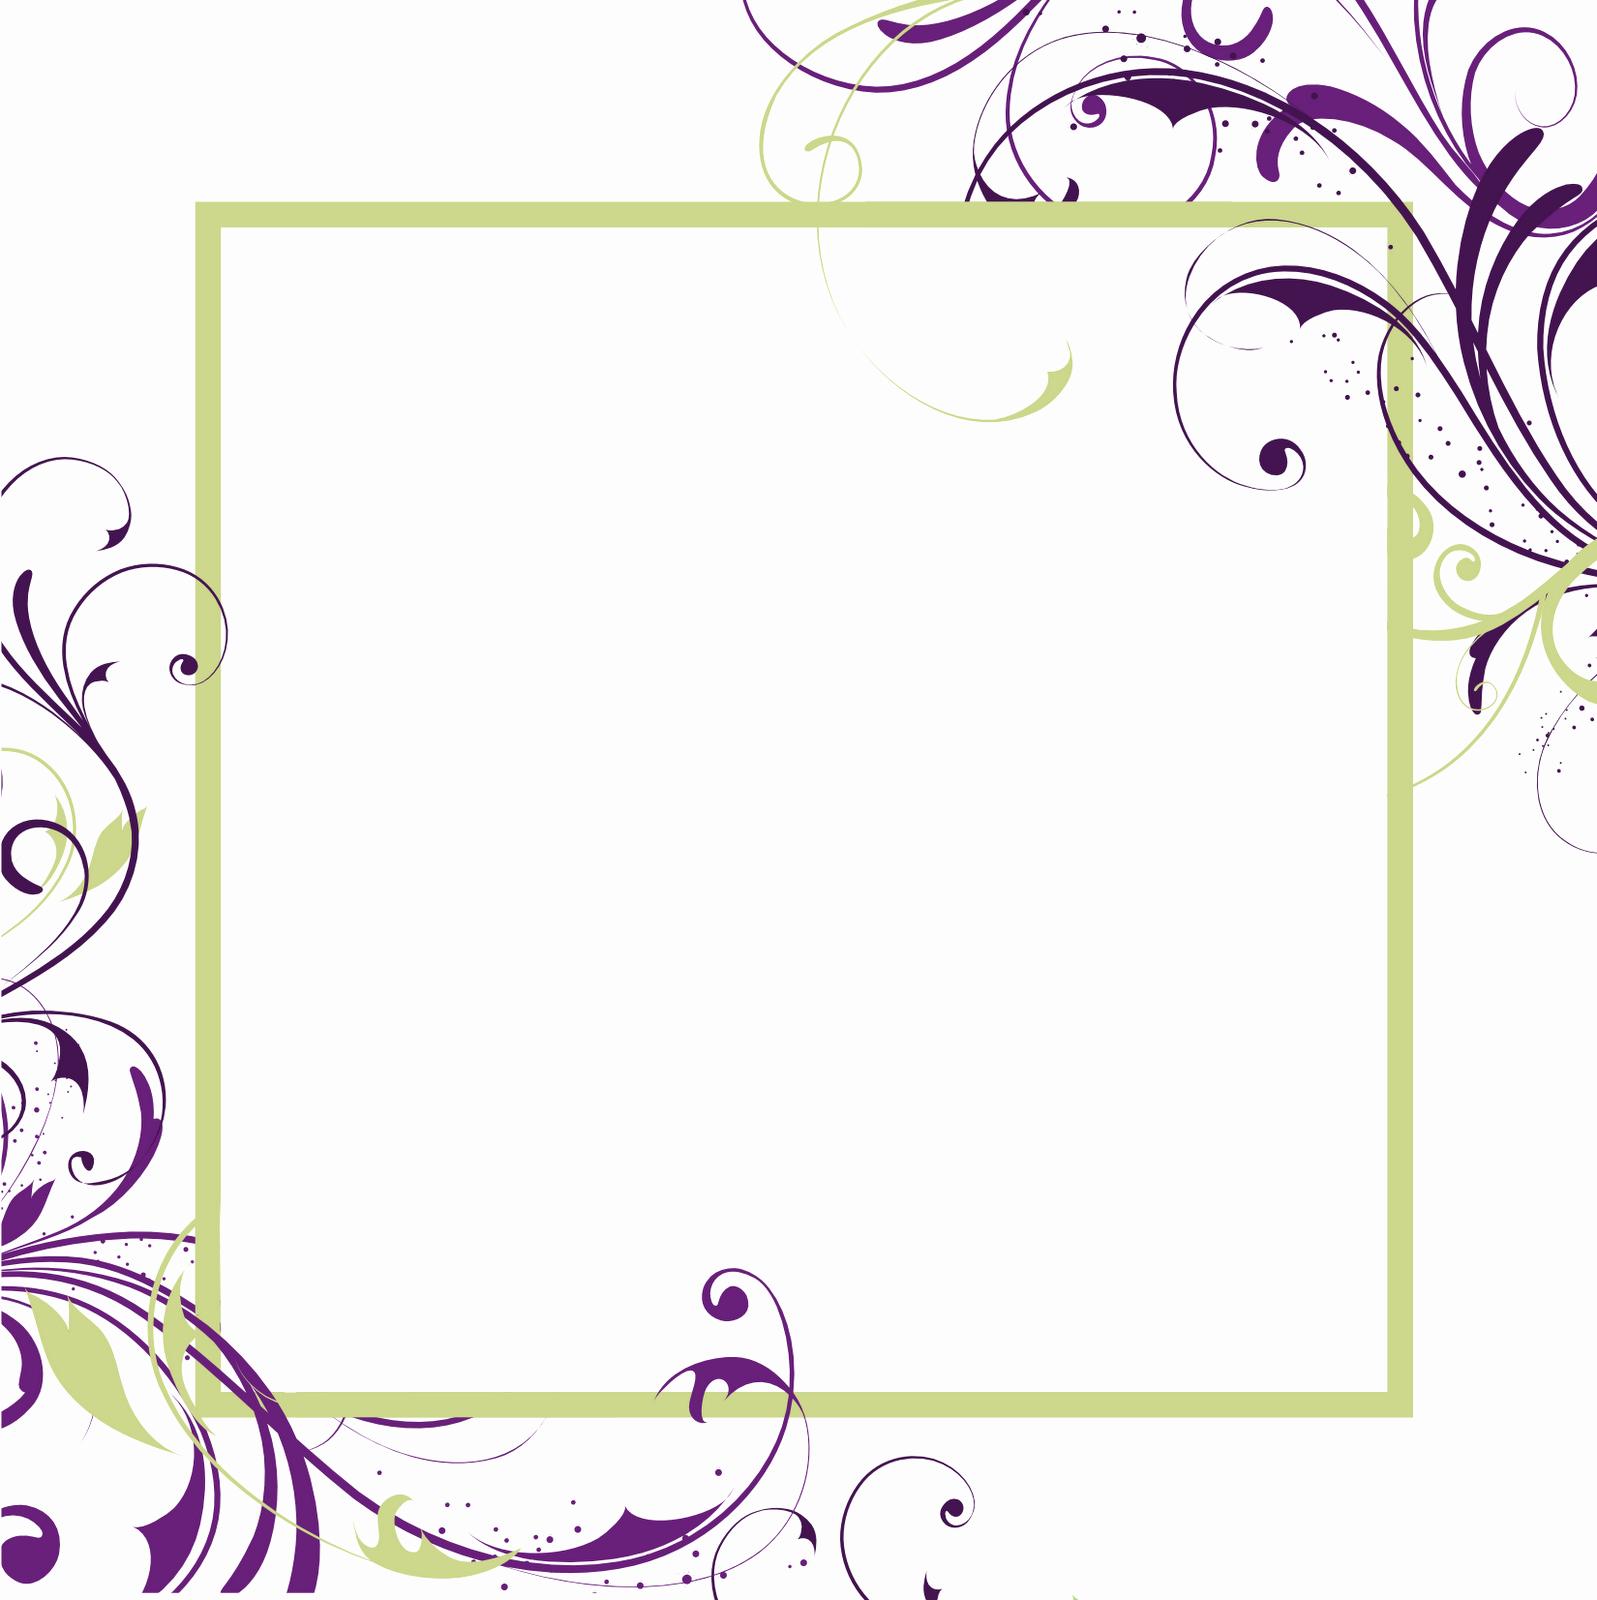 Wedding Borders for Microsoft Word Lovely Fancy Frame Border Transparent Free Bord Wedding